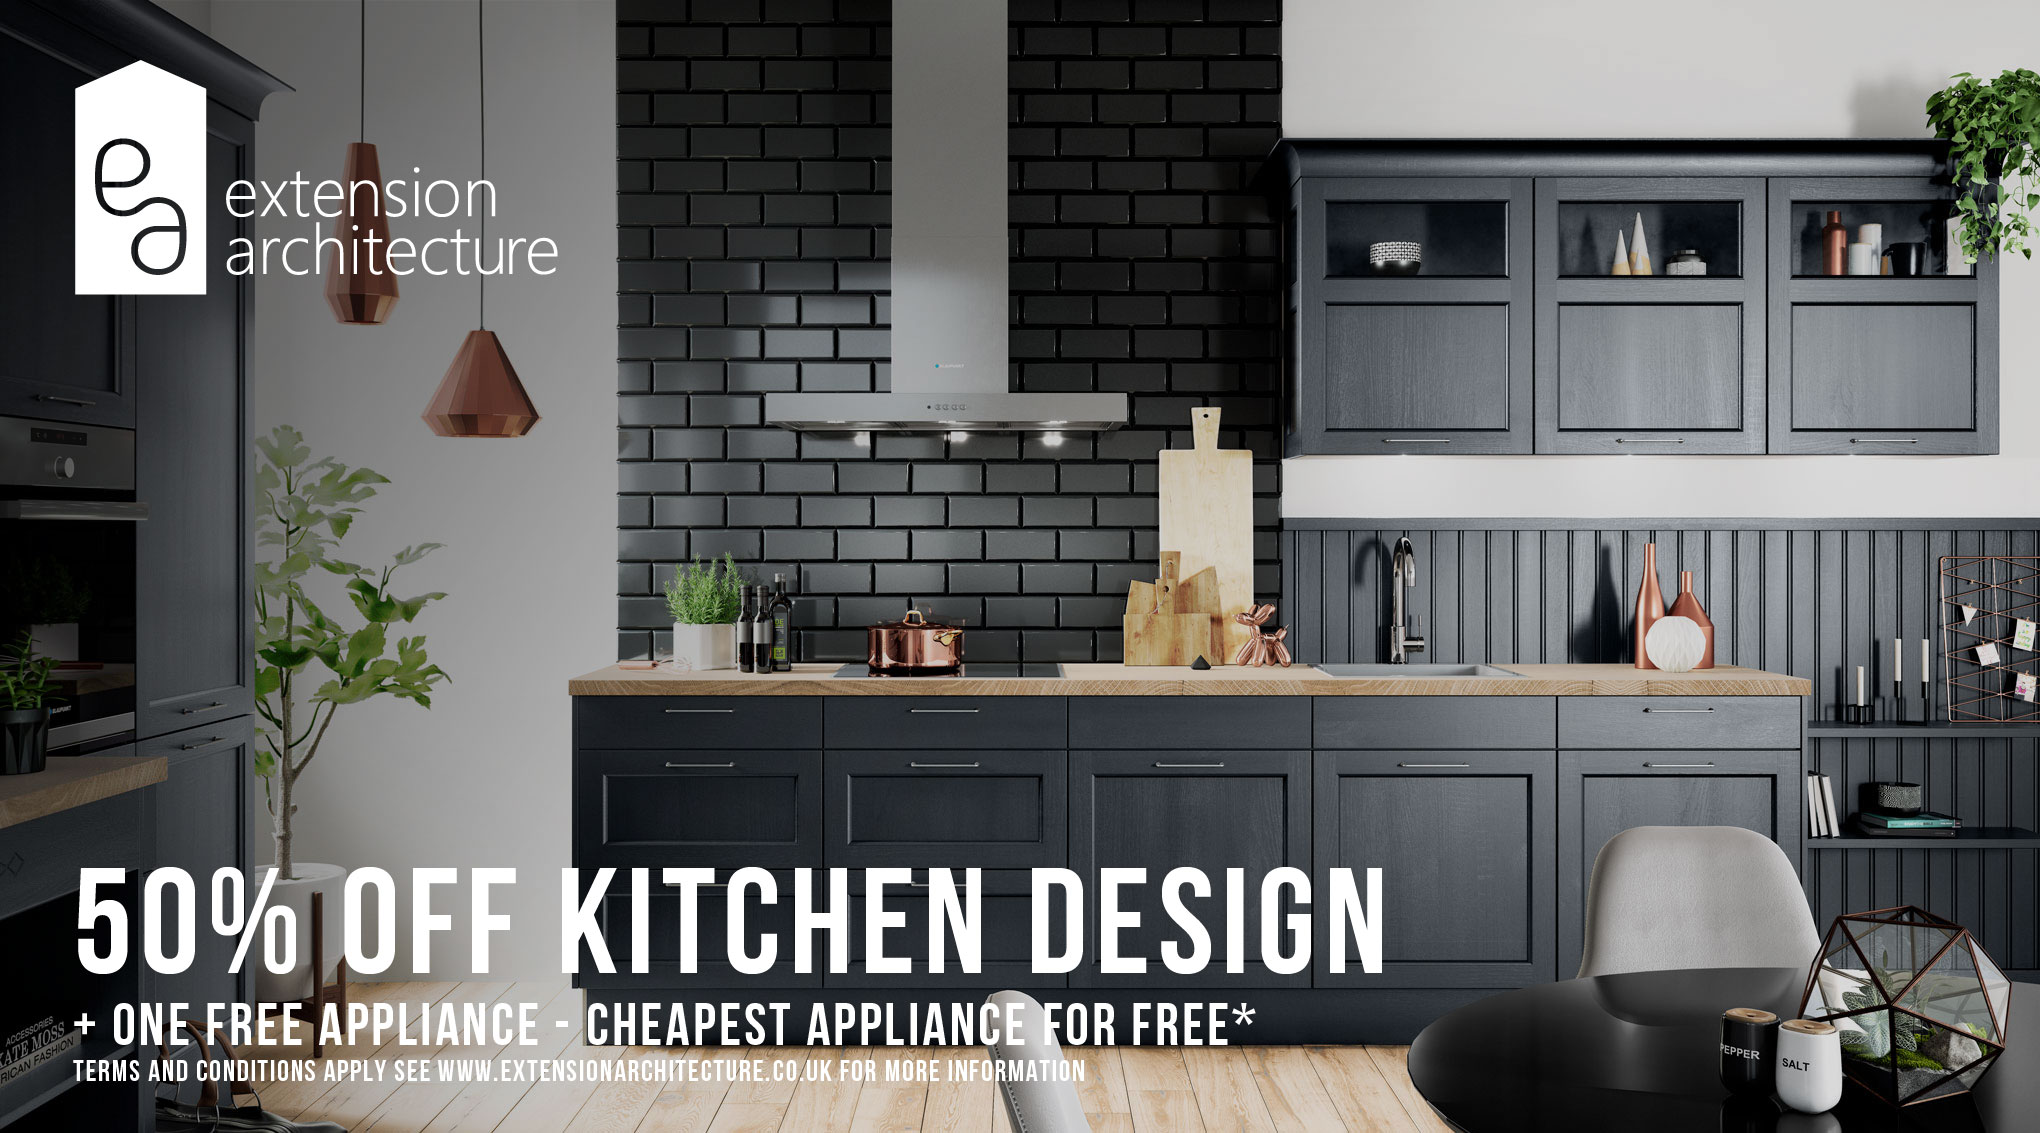 50% OFF Kitchen Design Service - Extension Architecture London